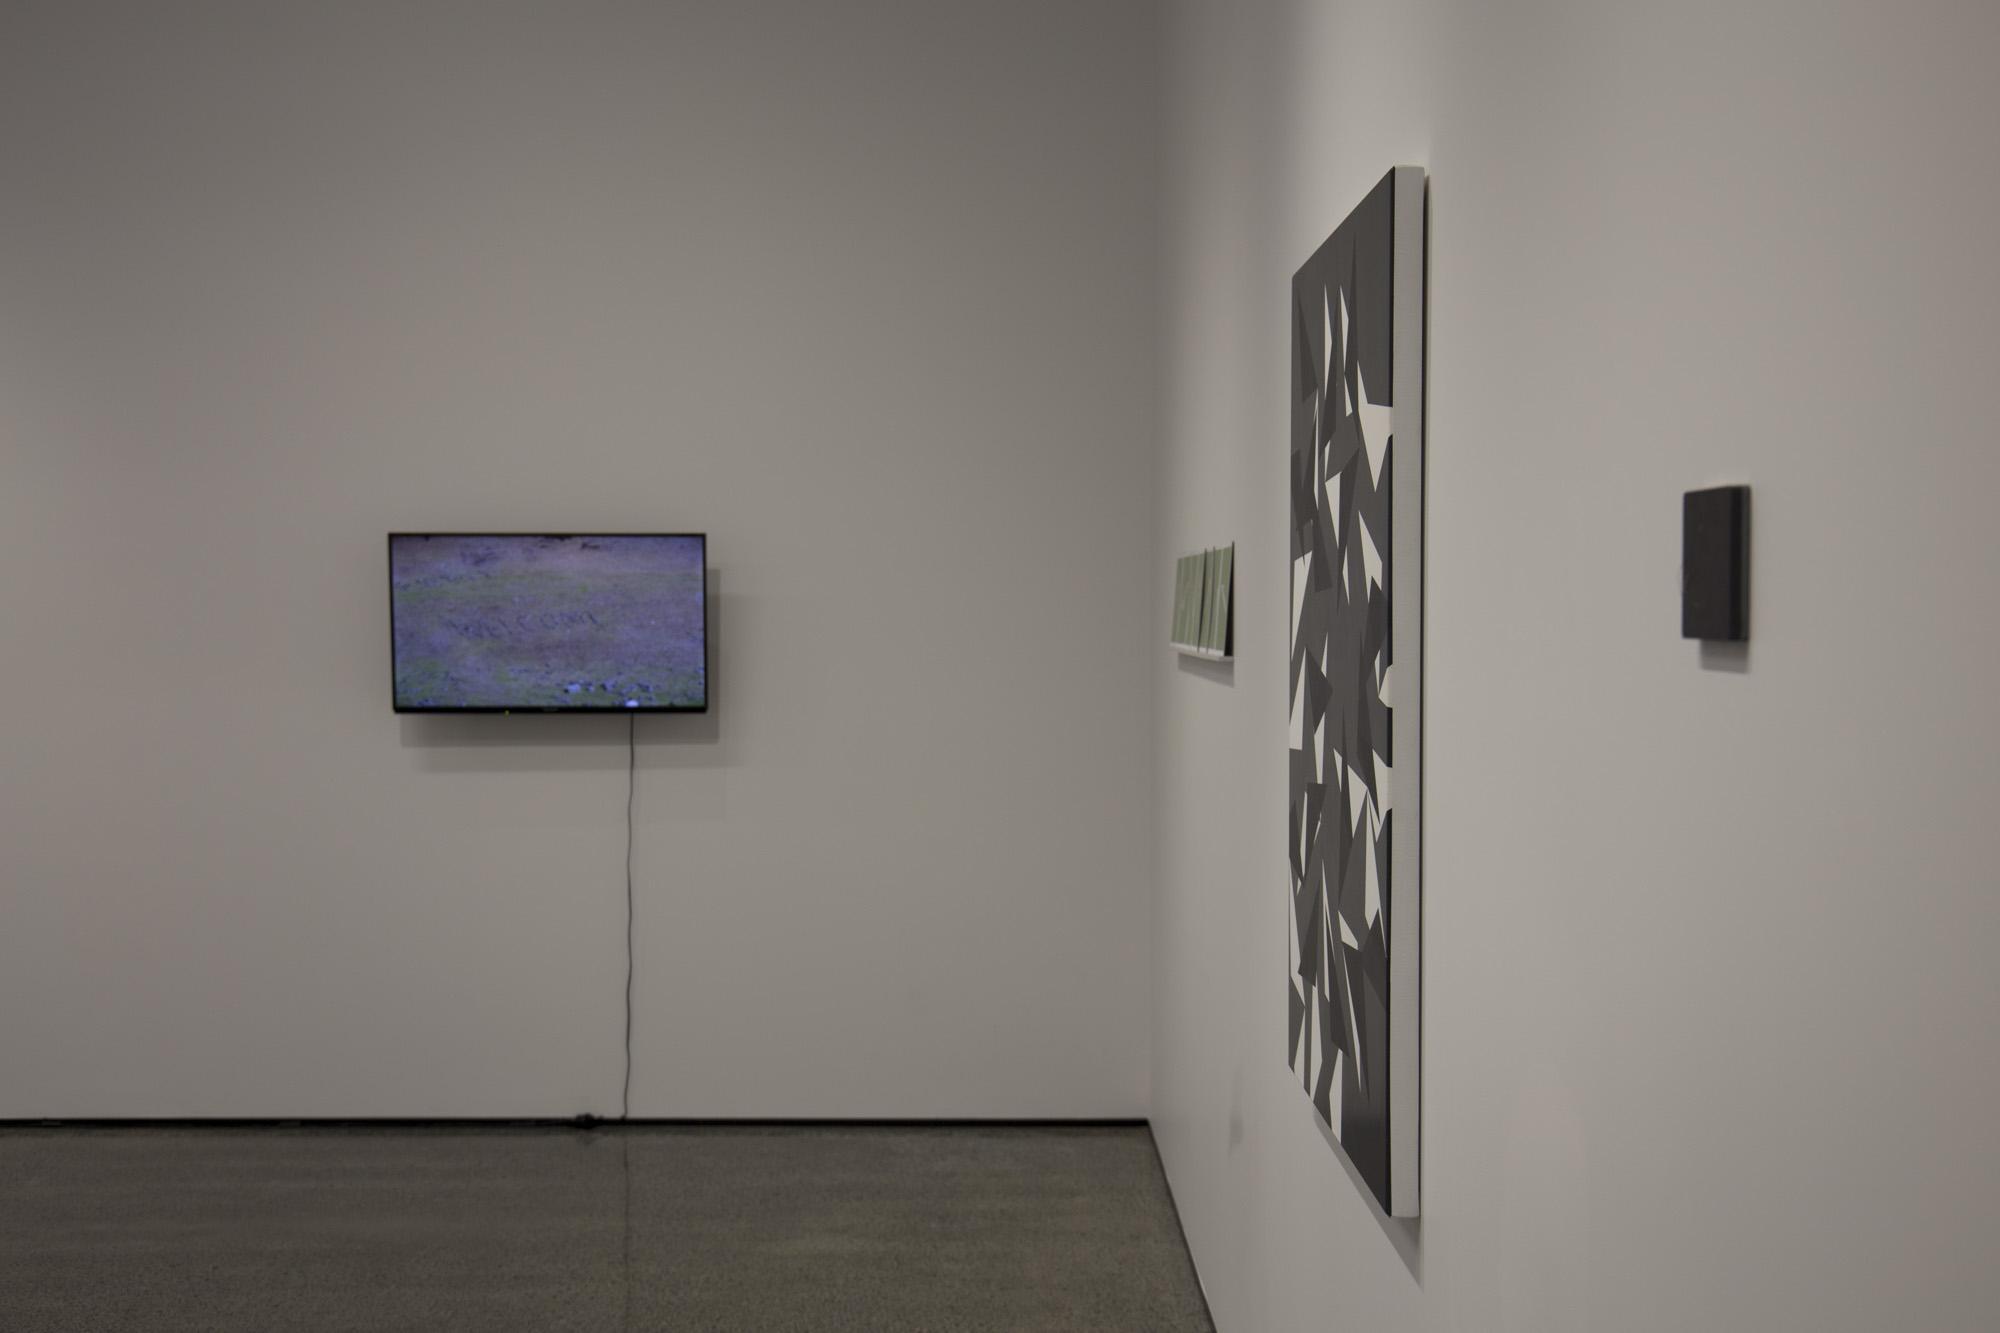 Left to right: Jeremy Leatinu'u,  The Welcome Project  (2 of 2), 2010; Shannon Novak,  Pianissimo 1–7 , 2016; Jeena Shin,  Motus 3 , 2014; Sarah Smuts-Kennedy,  Celestial Poles , 2015